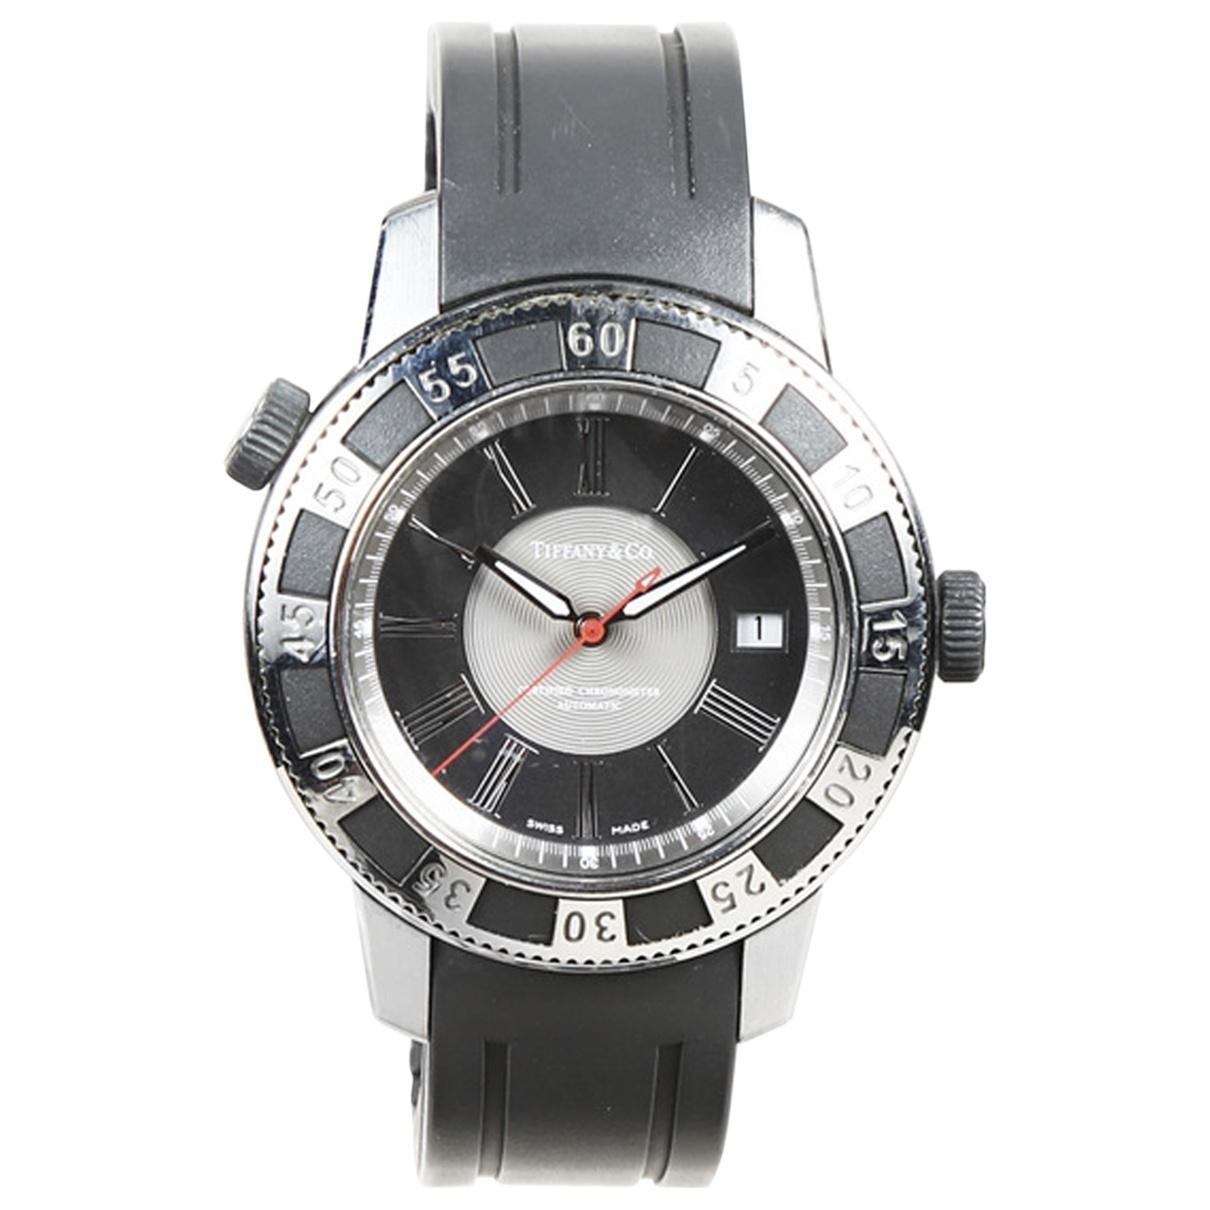 3da8b0f3c4b57 Lyst - Tiffany & Co. Pre-owned Silver Steel Watches in Metallic for Men